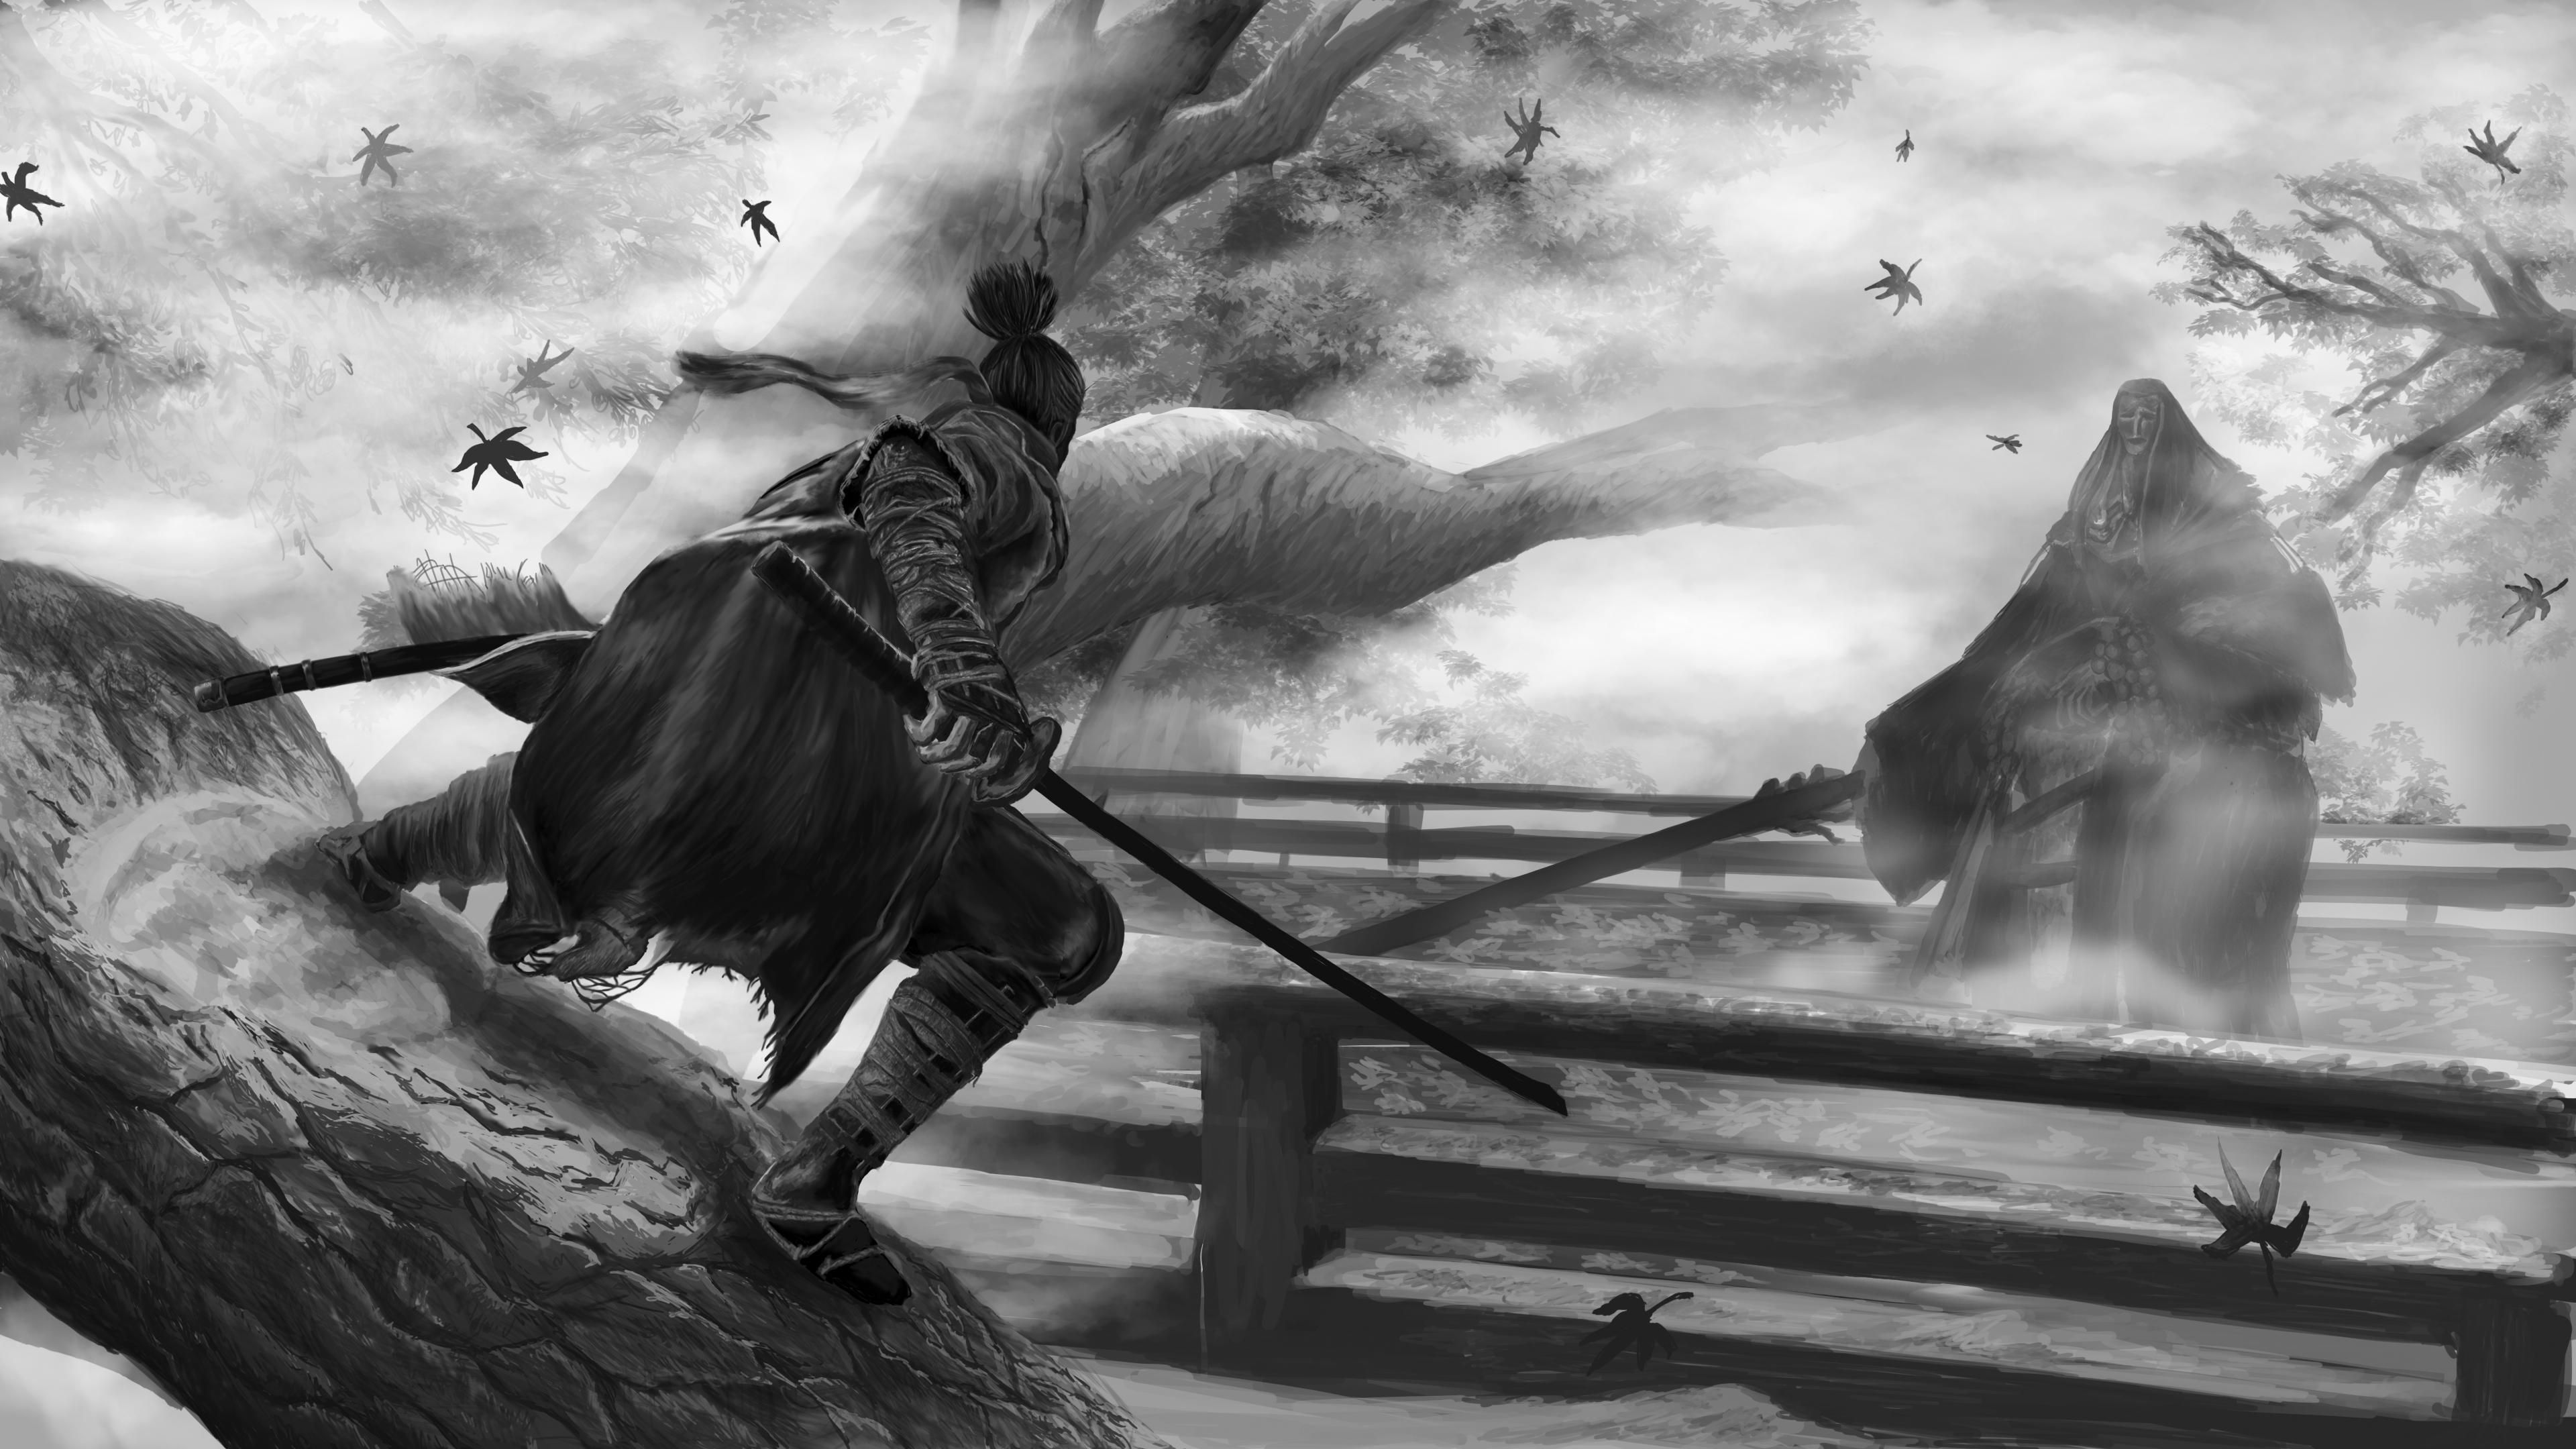 Sekiro Corrupted Monk Fight Digital 4k Dark Souls Art Dark Fantasy Art 4k Wallpapers For Pc